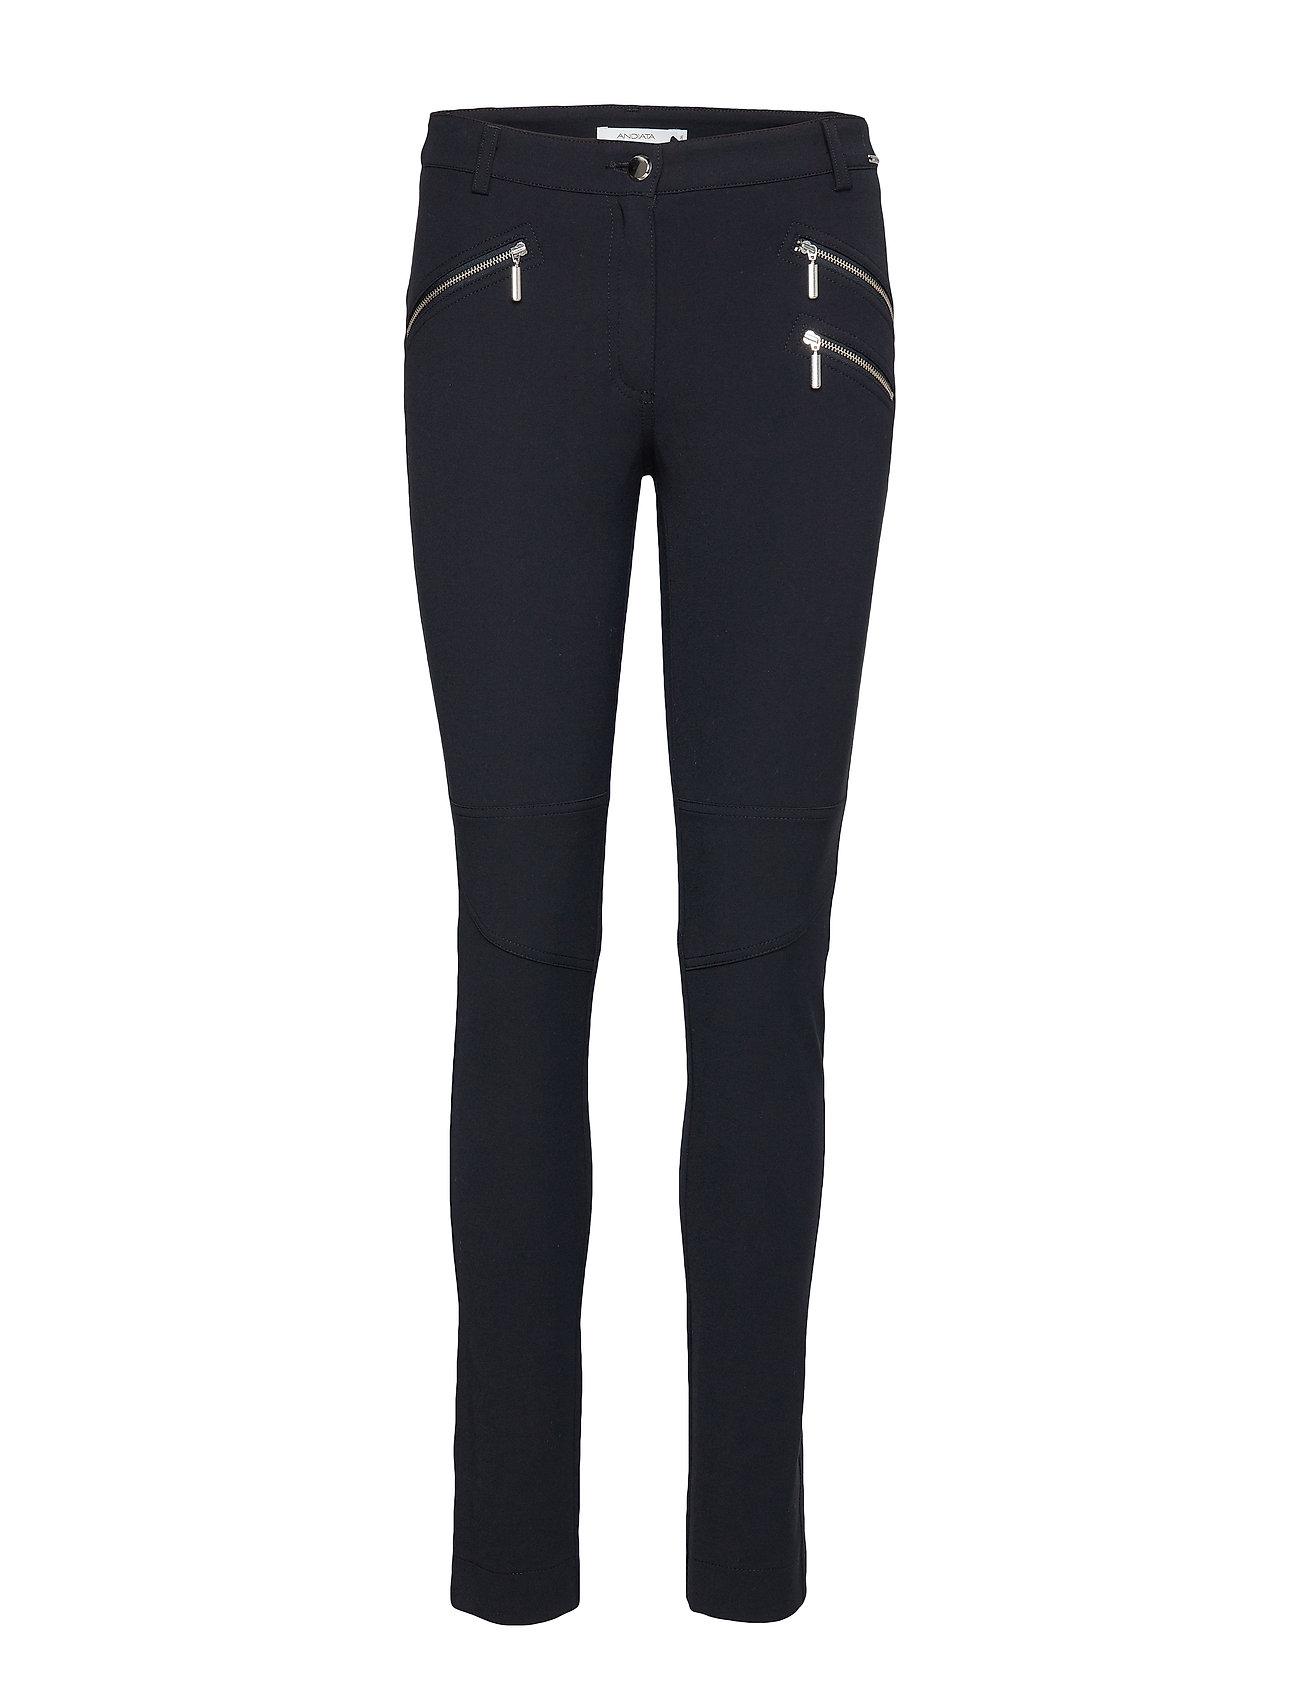 Image of Sacha 3 Trousers Smalle Bukser Skinny Pants Blå Andiata (3245420943)